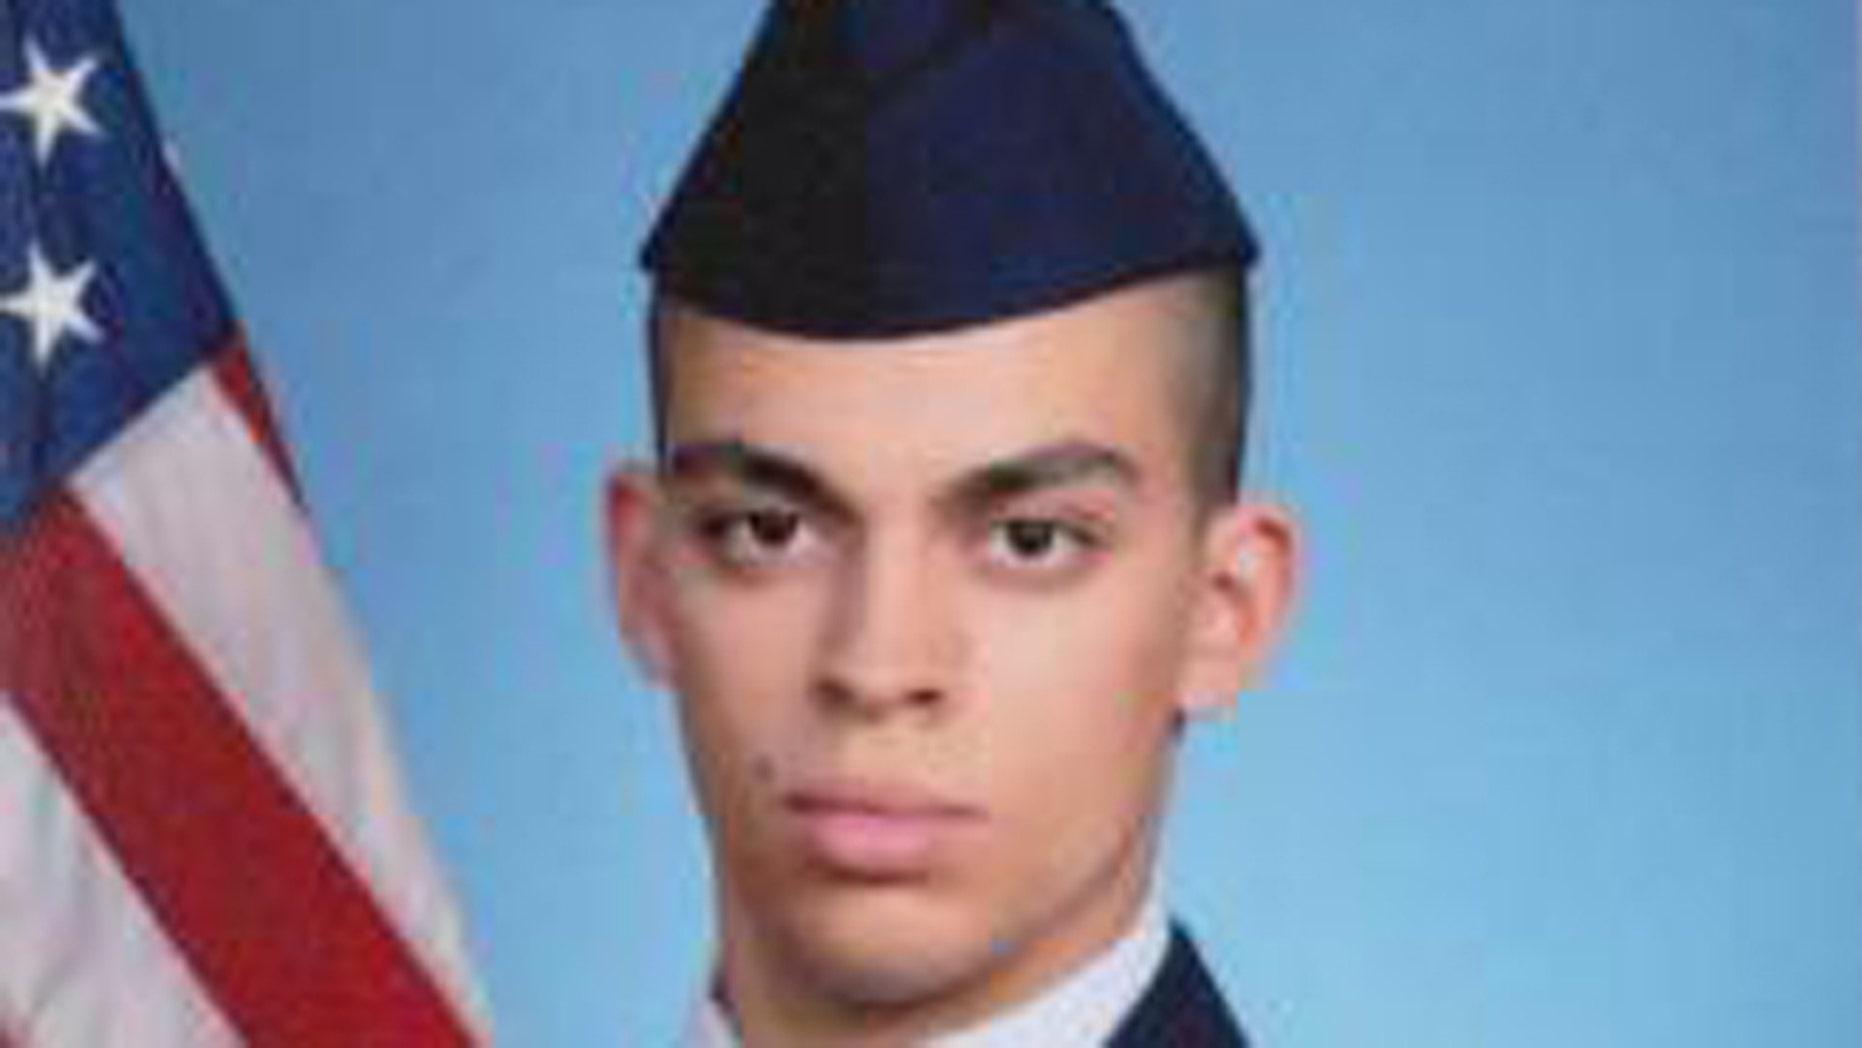 Dover Air Force senior airman Keifer Huhman disappeared Feb. 7, 2016.